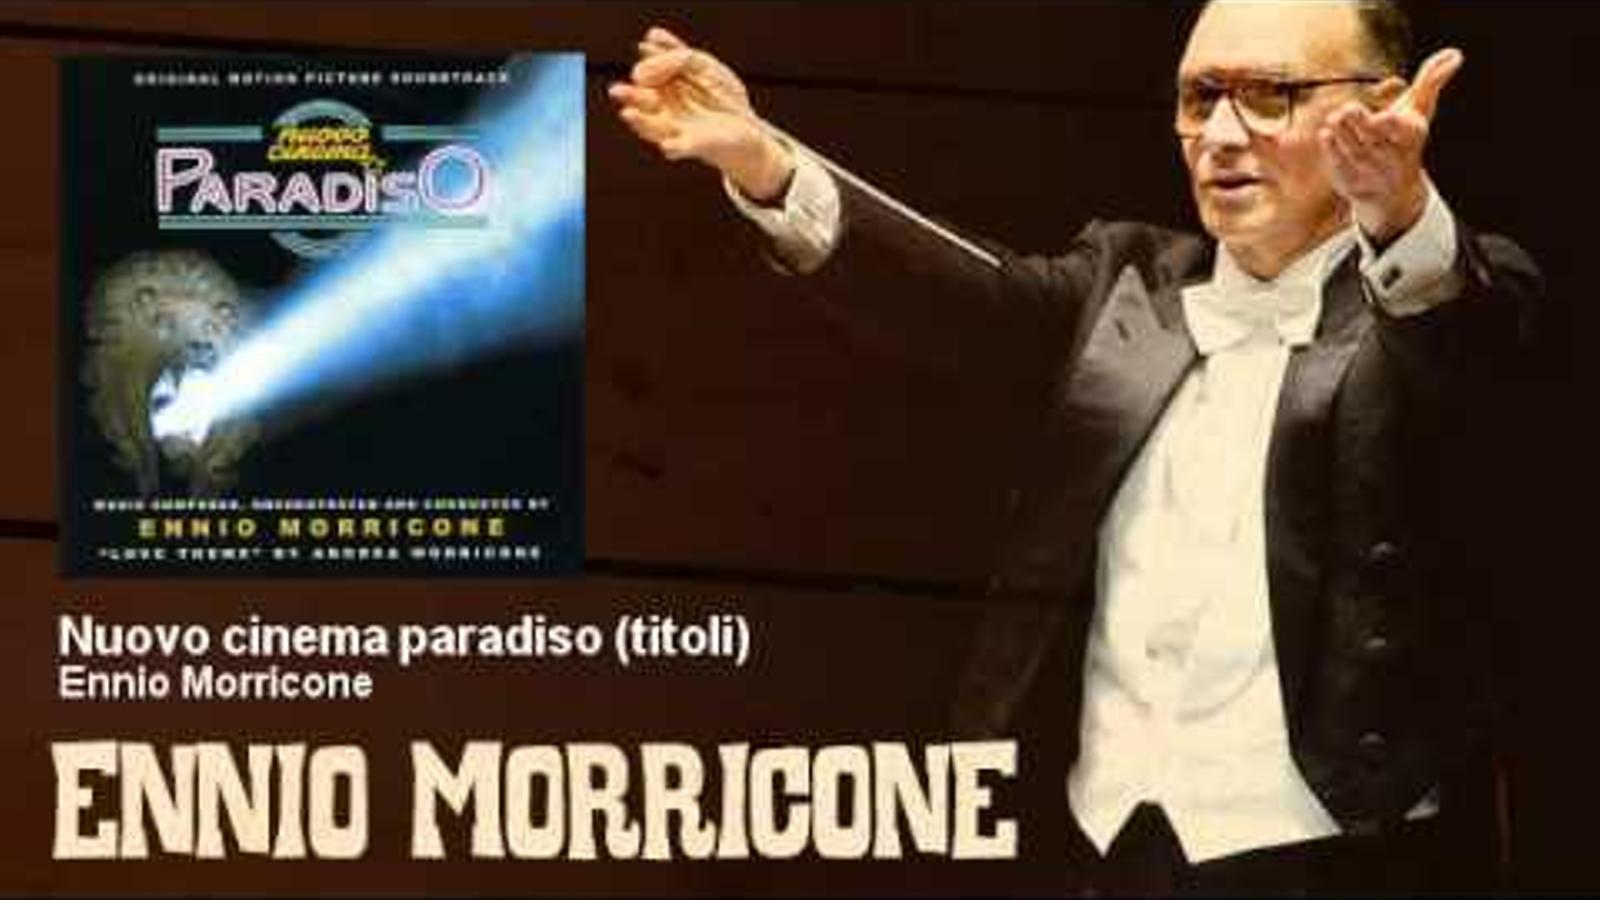 'Nuovo Cinema Paradiso', d'Ennio Morricone